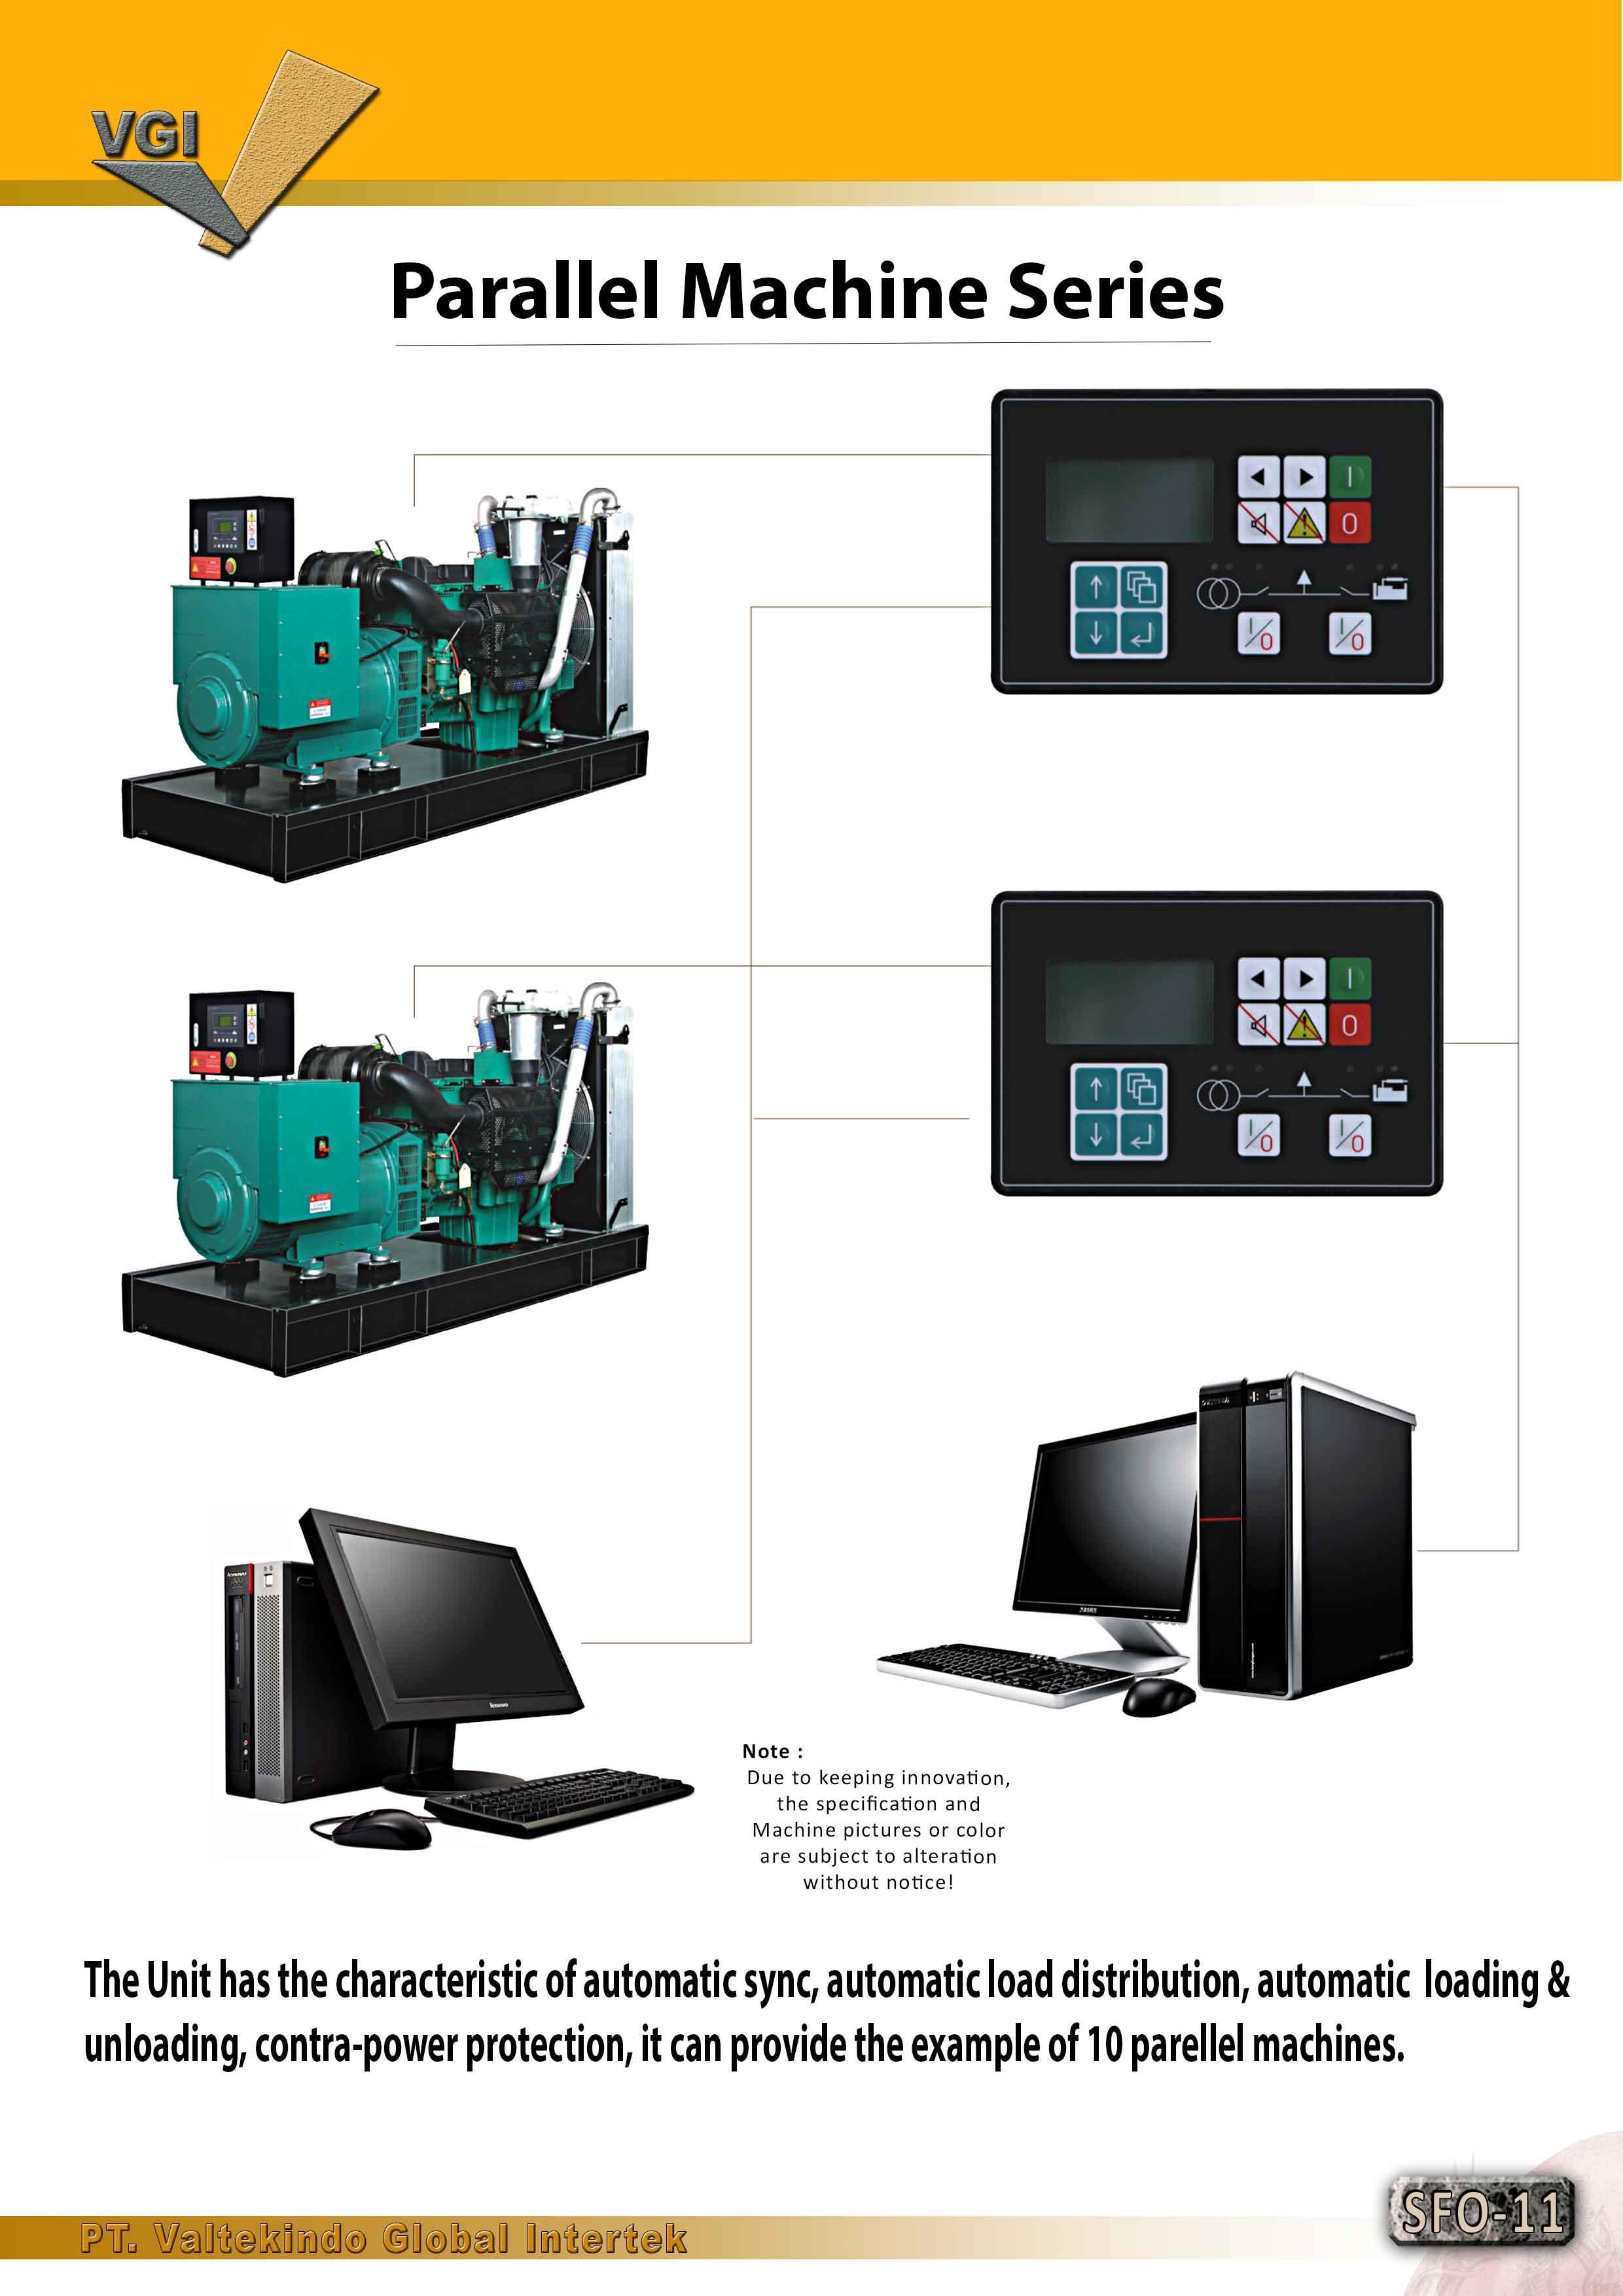 jual mesin Parallel Machine Series Parallel Machine Series